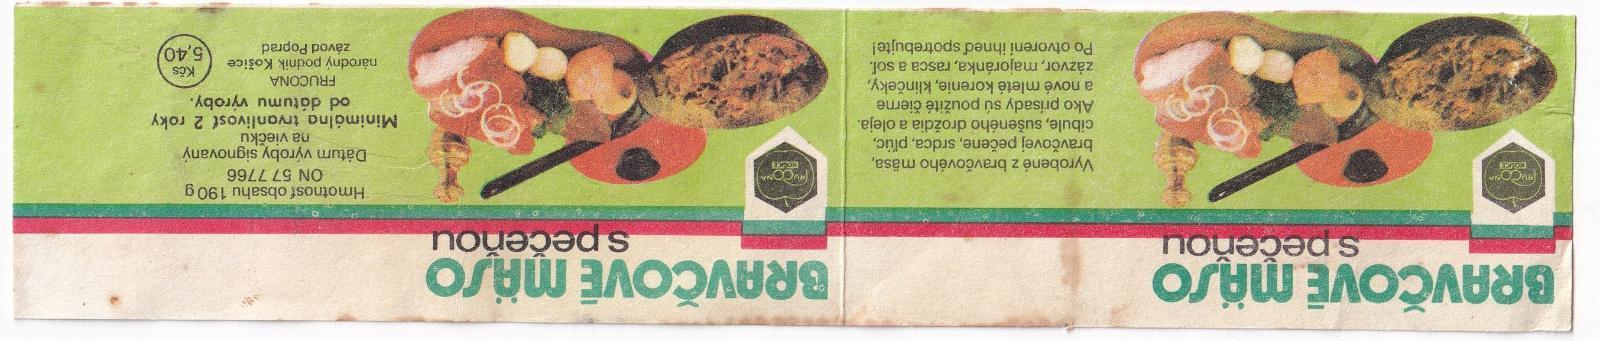 Etiketa bravčové maso, Frucona Košice - Ostatní